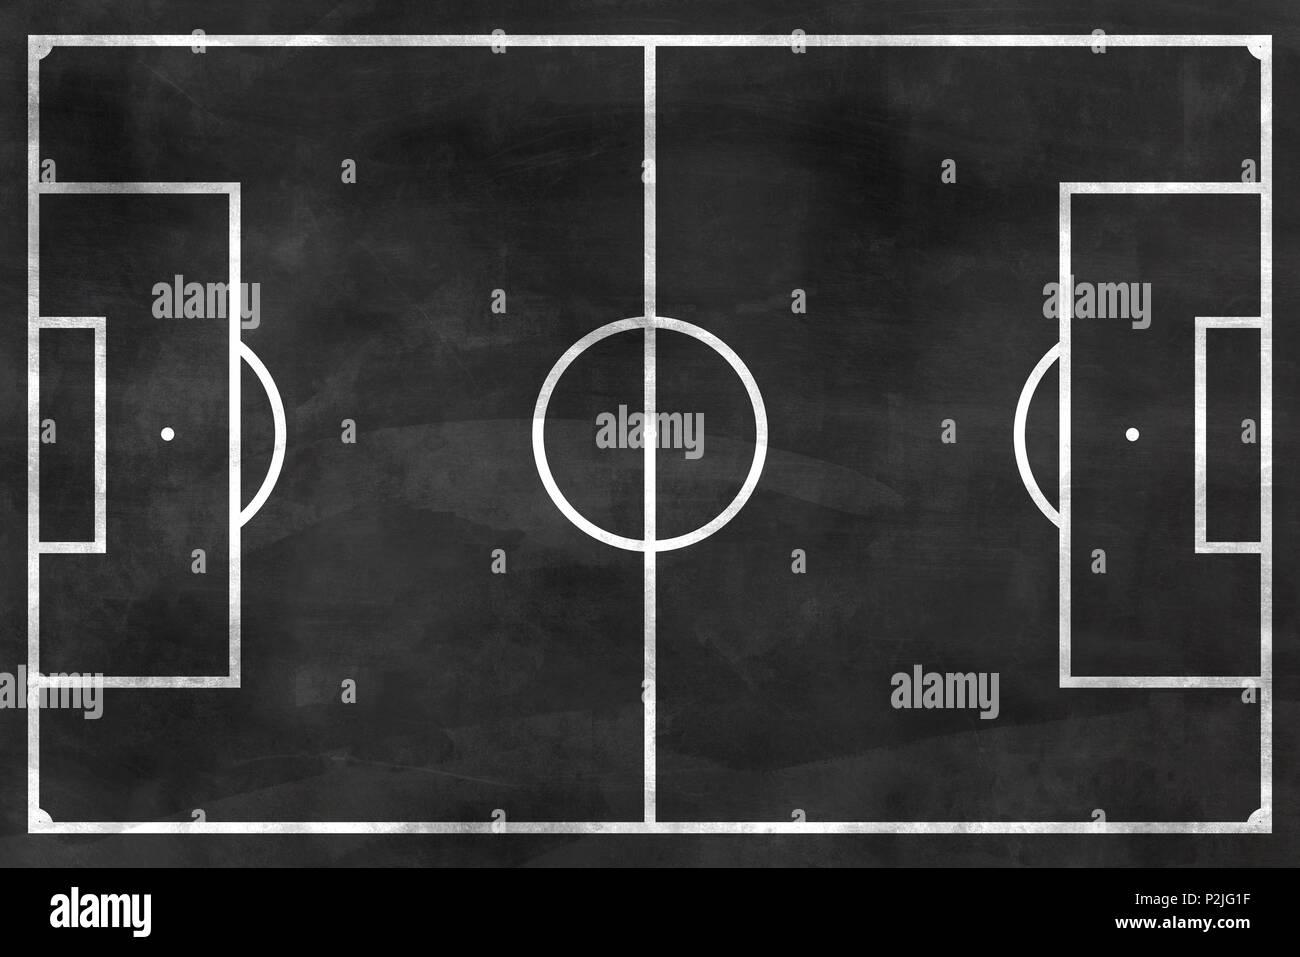 Fussball Feld Auf Schwarz Schwarzes Brett Stockfoto Bild